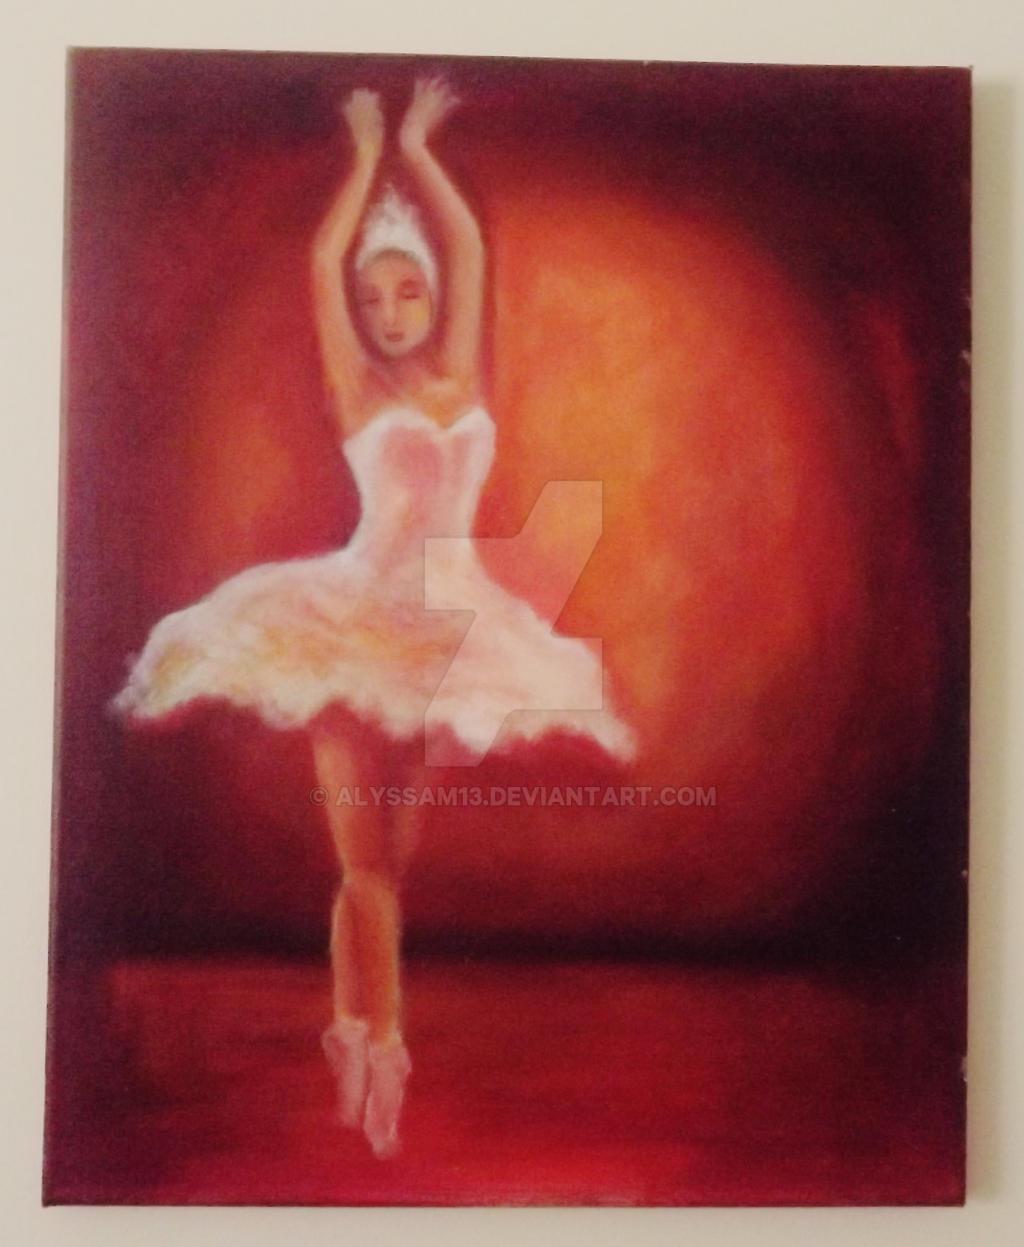 Dancer by Alyssam13